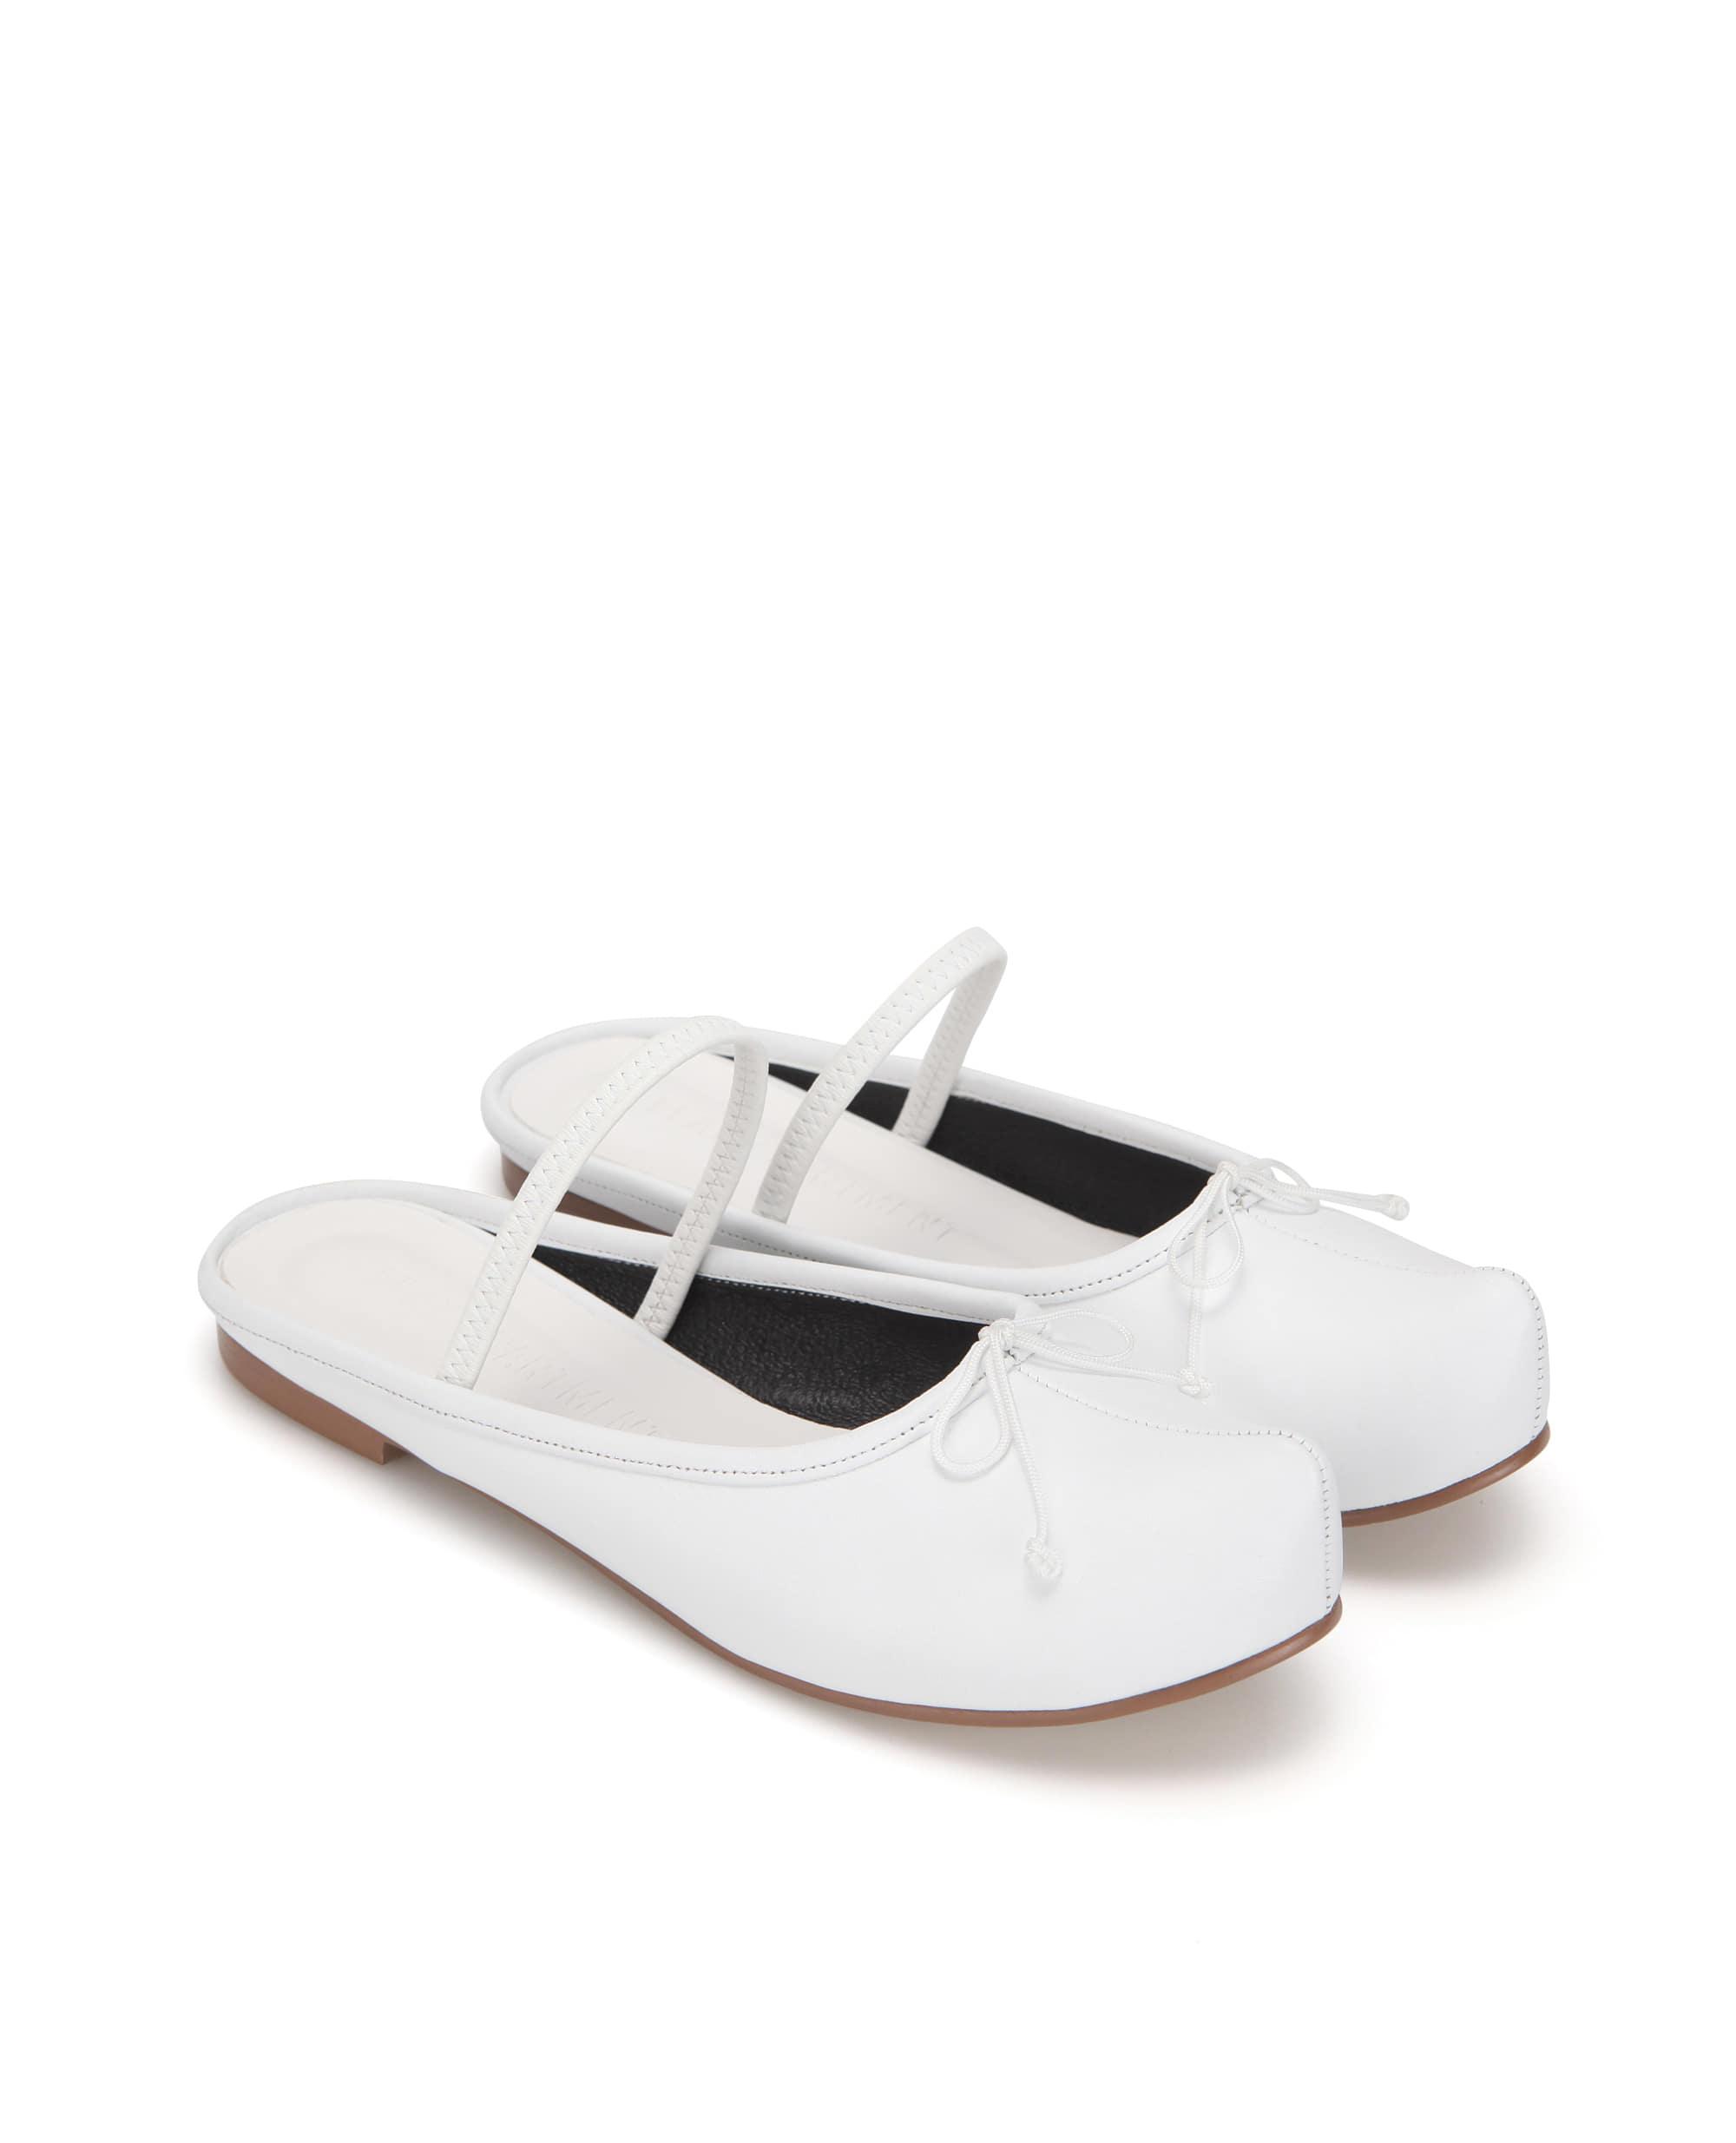 Flat apartment, flat shoes, flats, sabot, mules, flat apartment shoes, shoes, ballerina shoes, 플랫아파트먼트, 플랫슈즈, 사보, 뮬, 발레리나슈즈